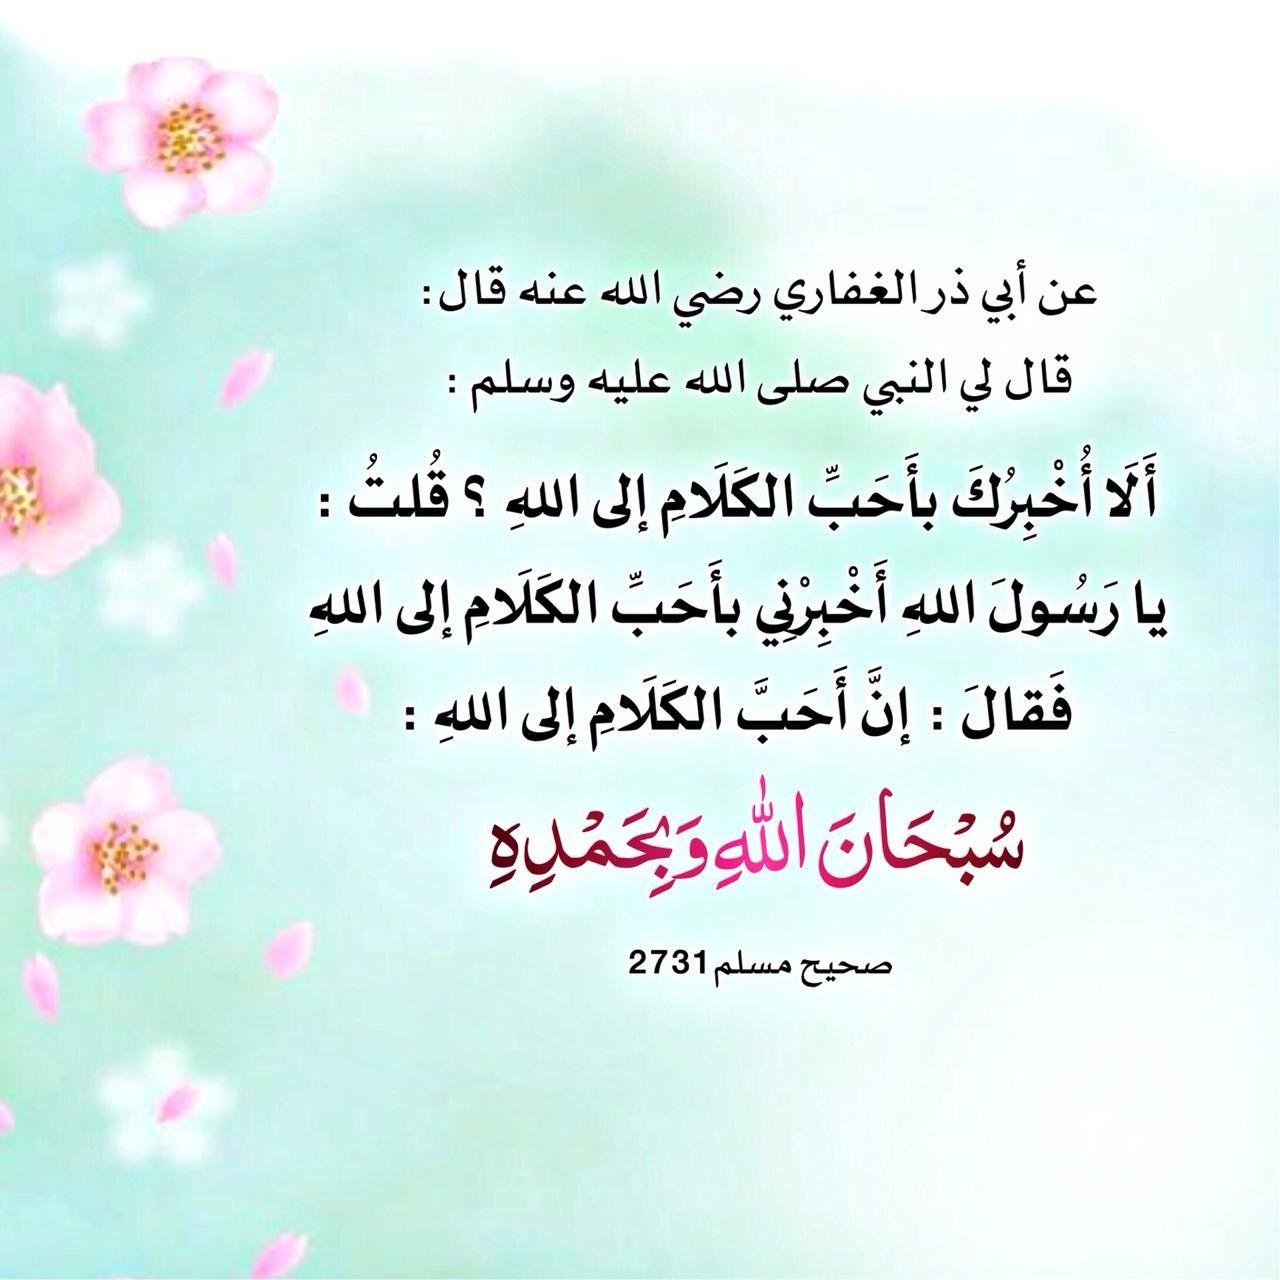 Pin By Athkaar Islamic On ذكرالله Peace Be Upon Him Peace Islam